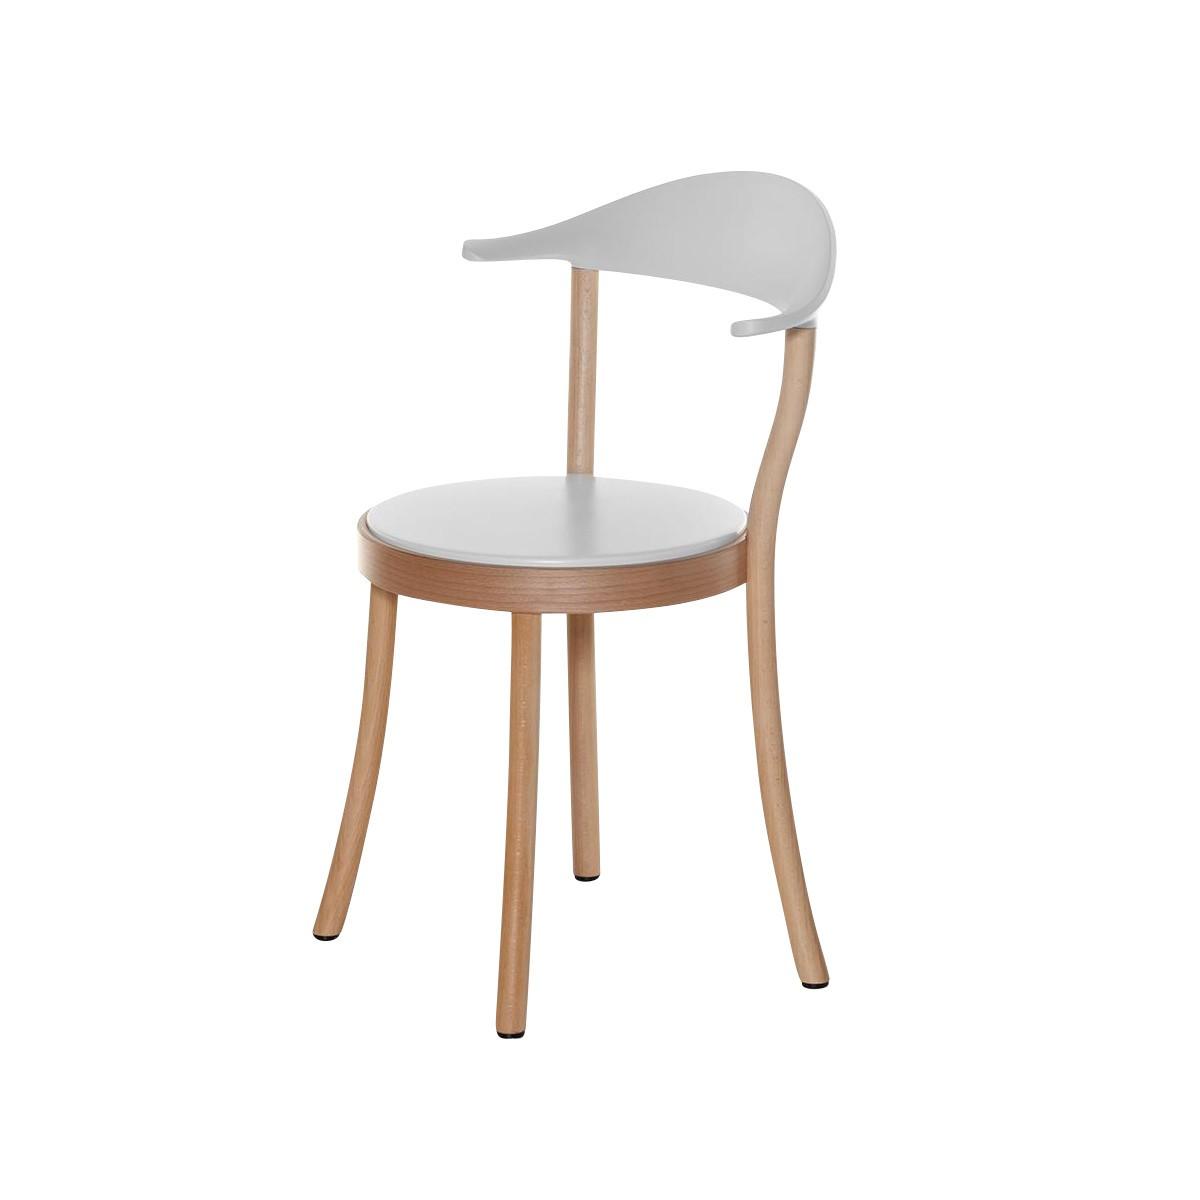 plank monza bistro chair ambientedirect. Black Bedroom Furniture Sets. Home Design Ideas